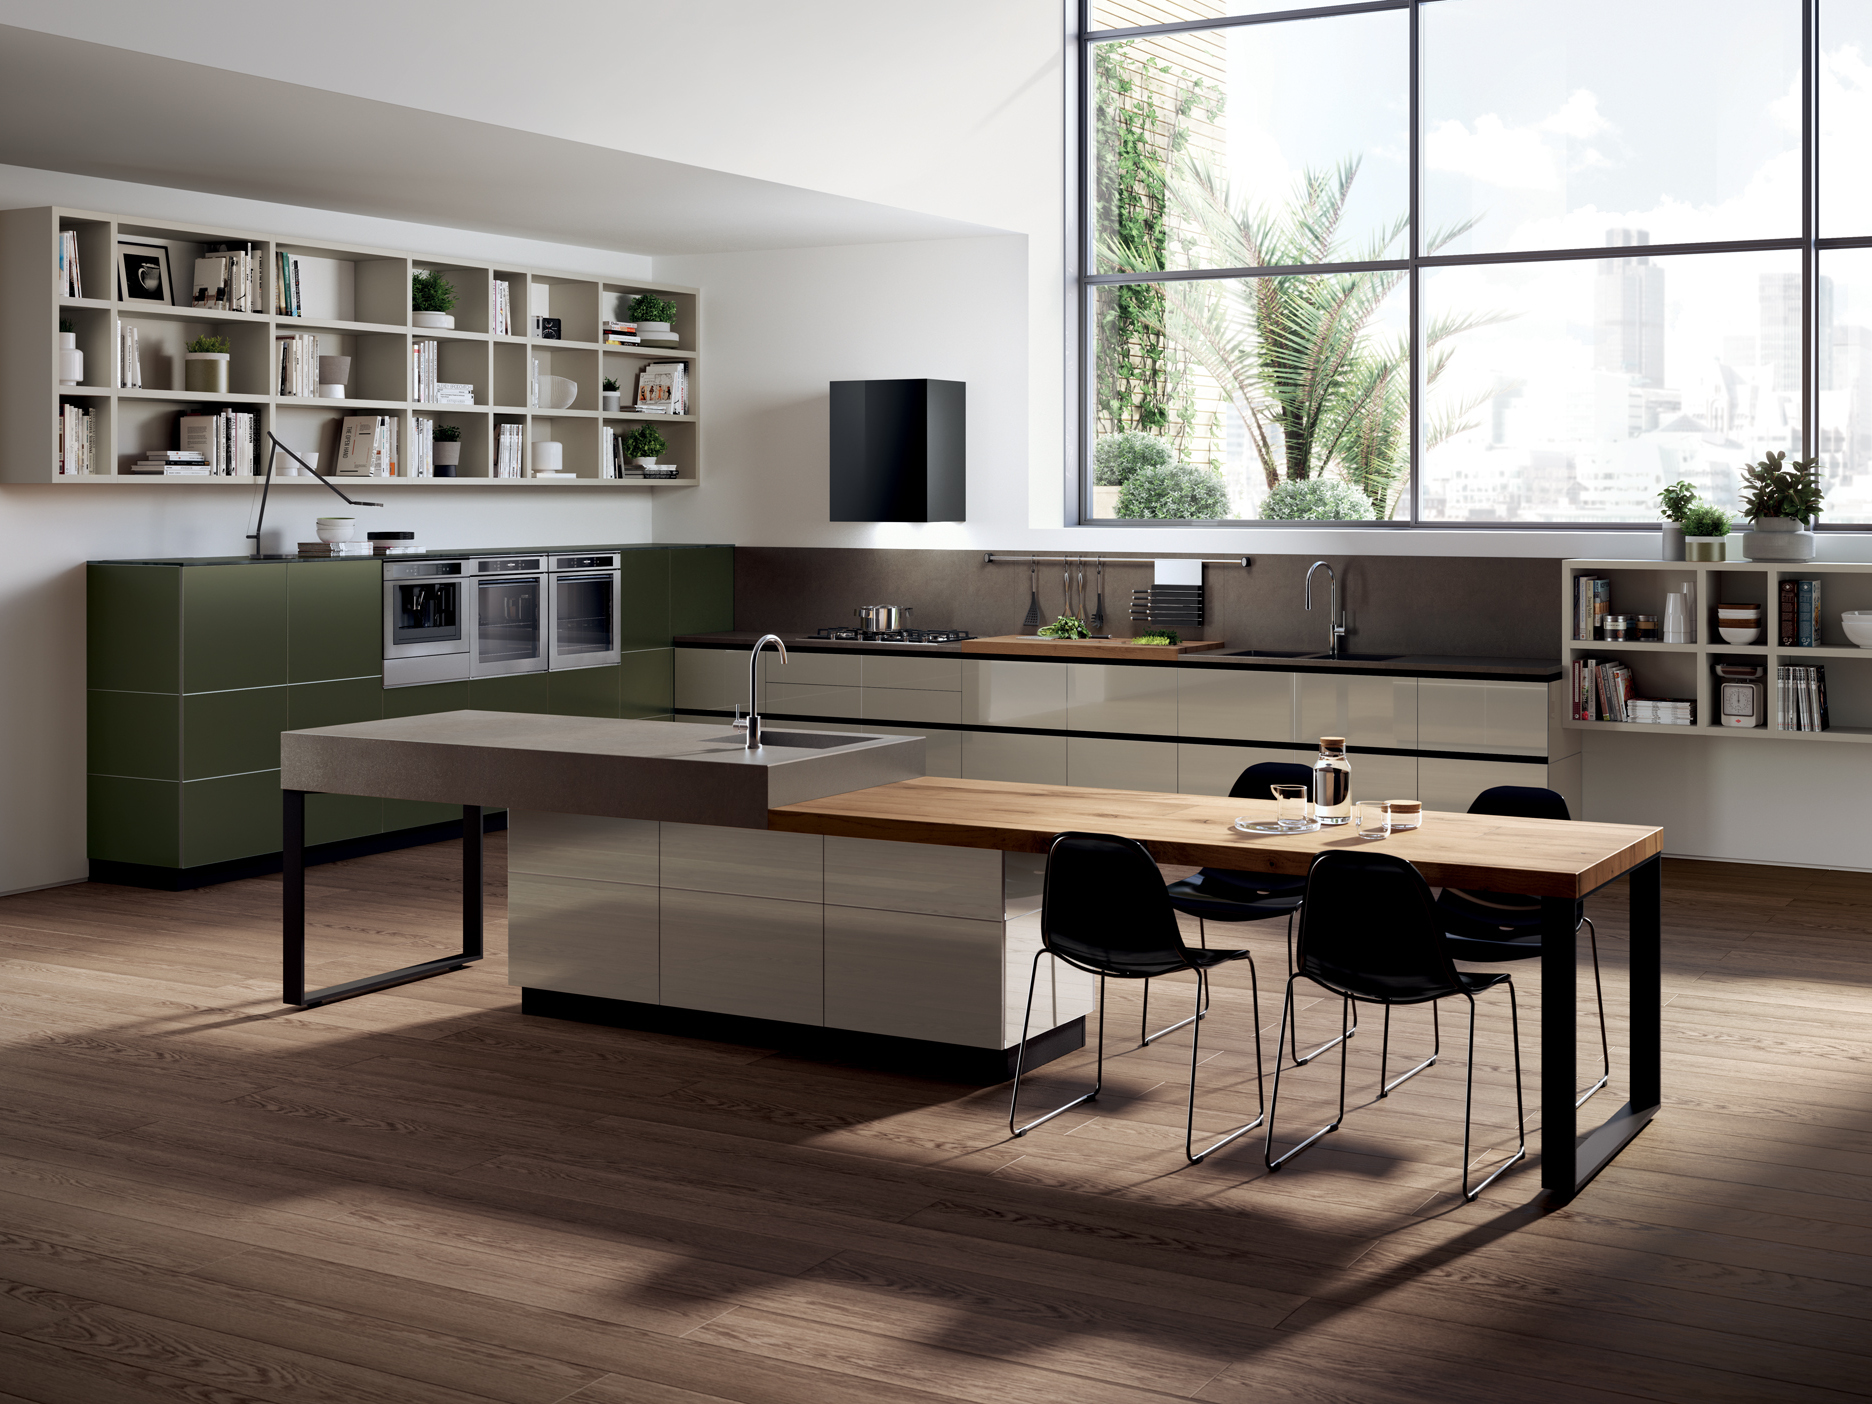 Fitted kitchen tetrix scavolini line by scavolini design - Fotos de cocinas americanas ...